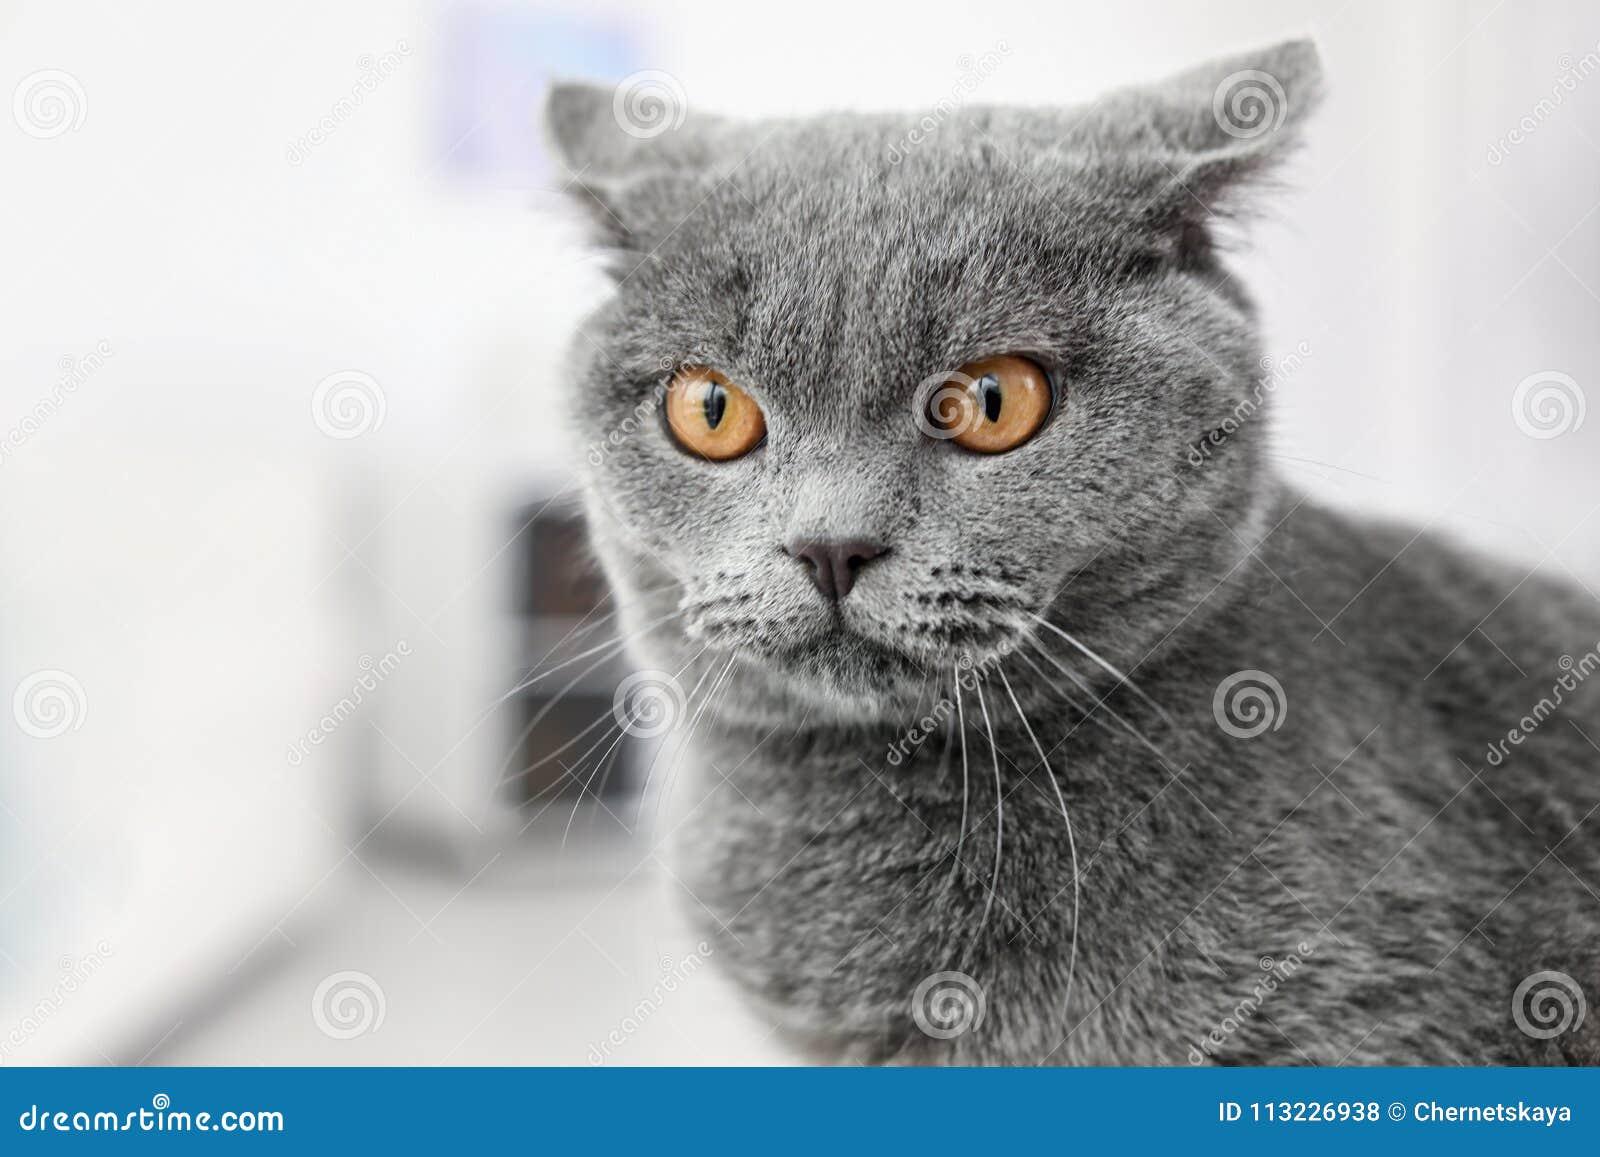 Cute lovely cat